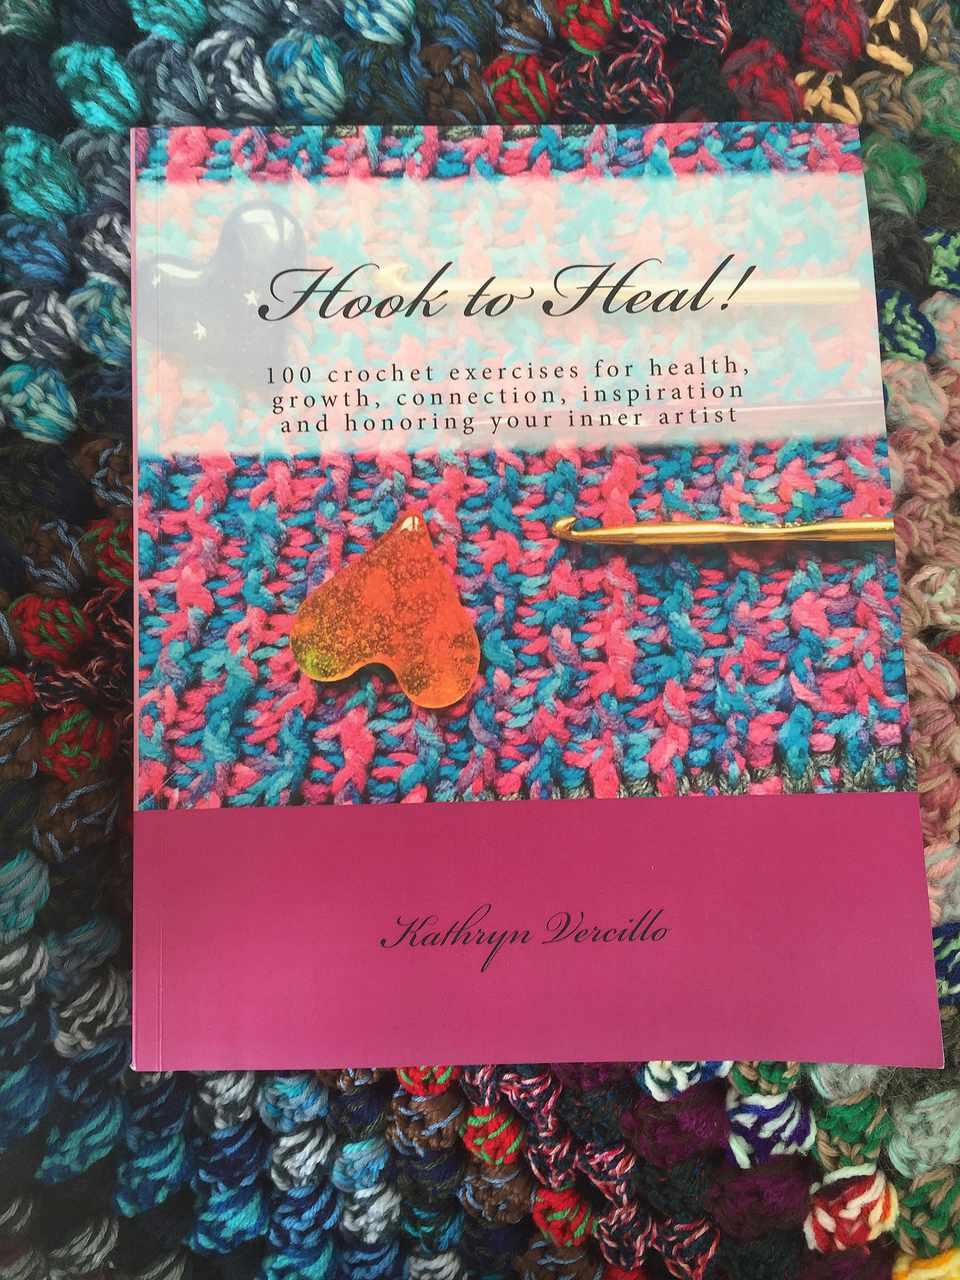 Hook to Heal Crochet Book